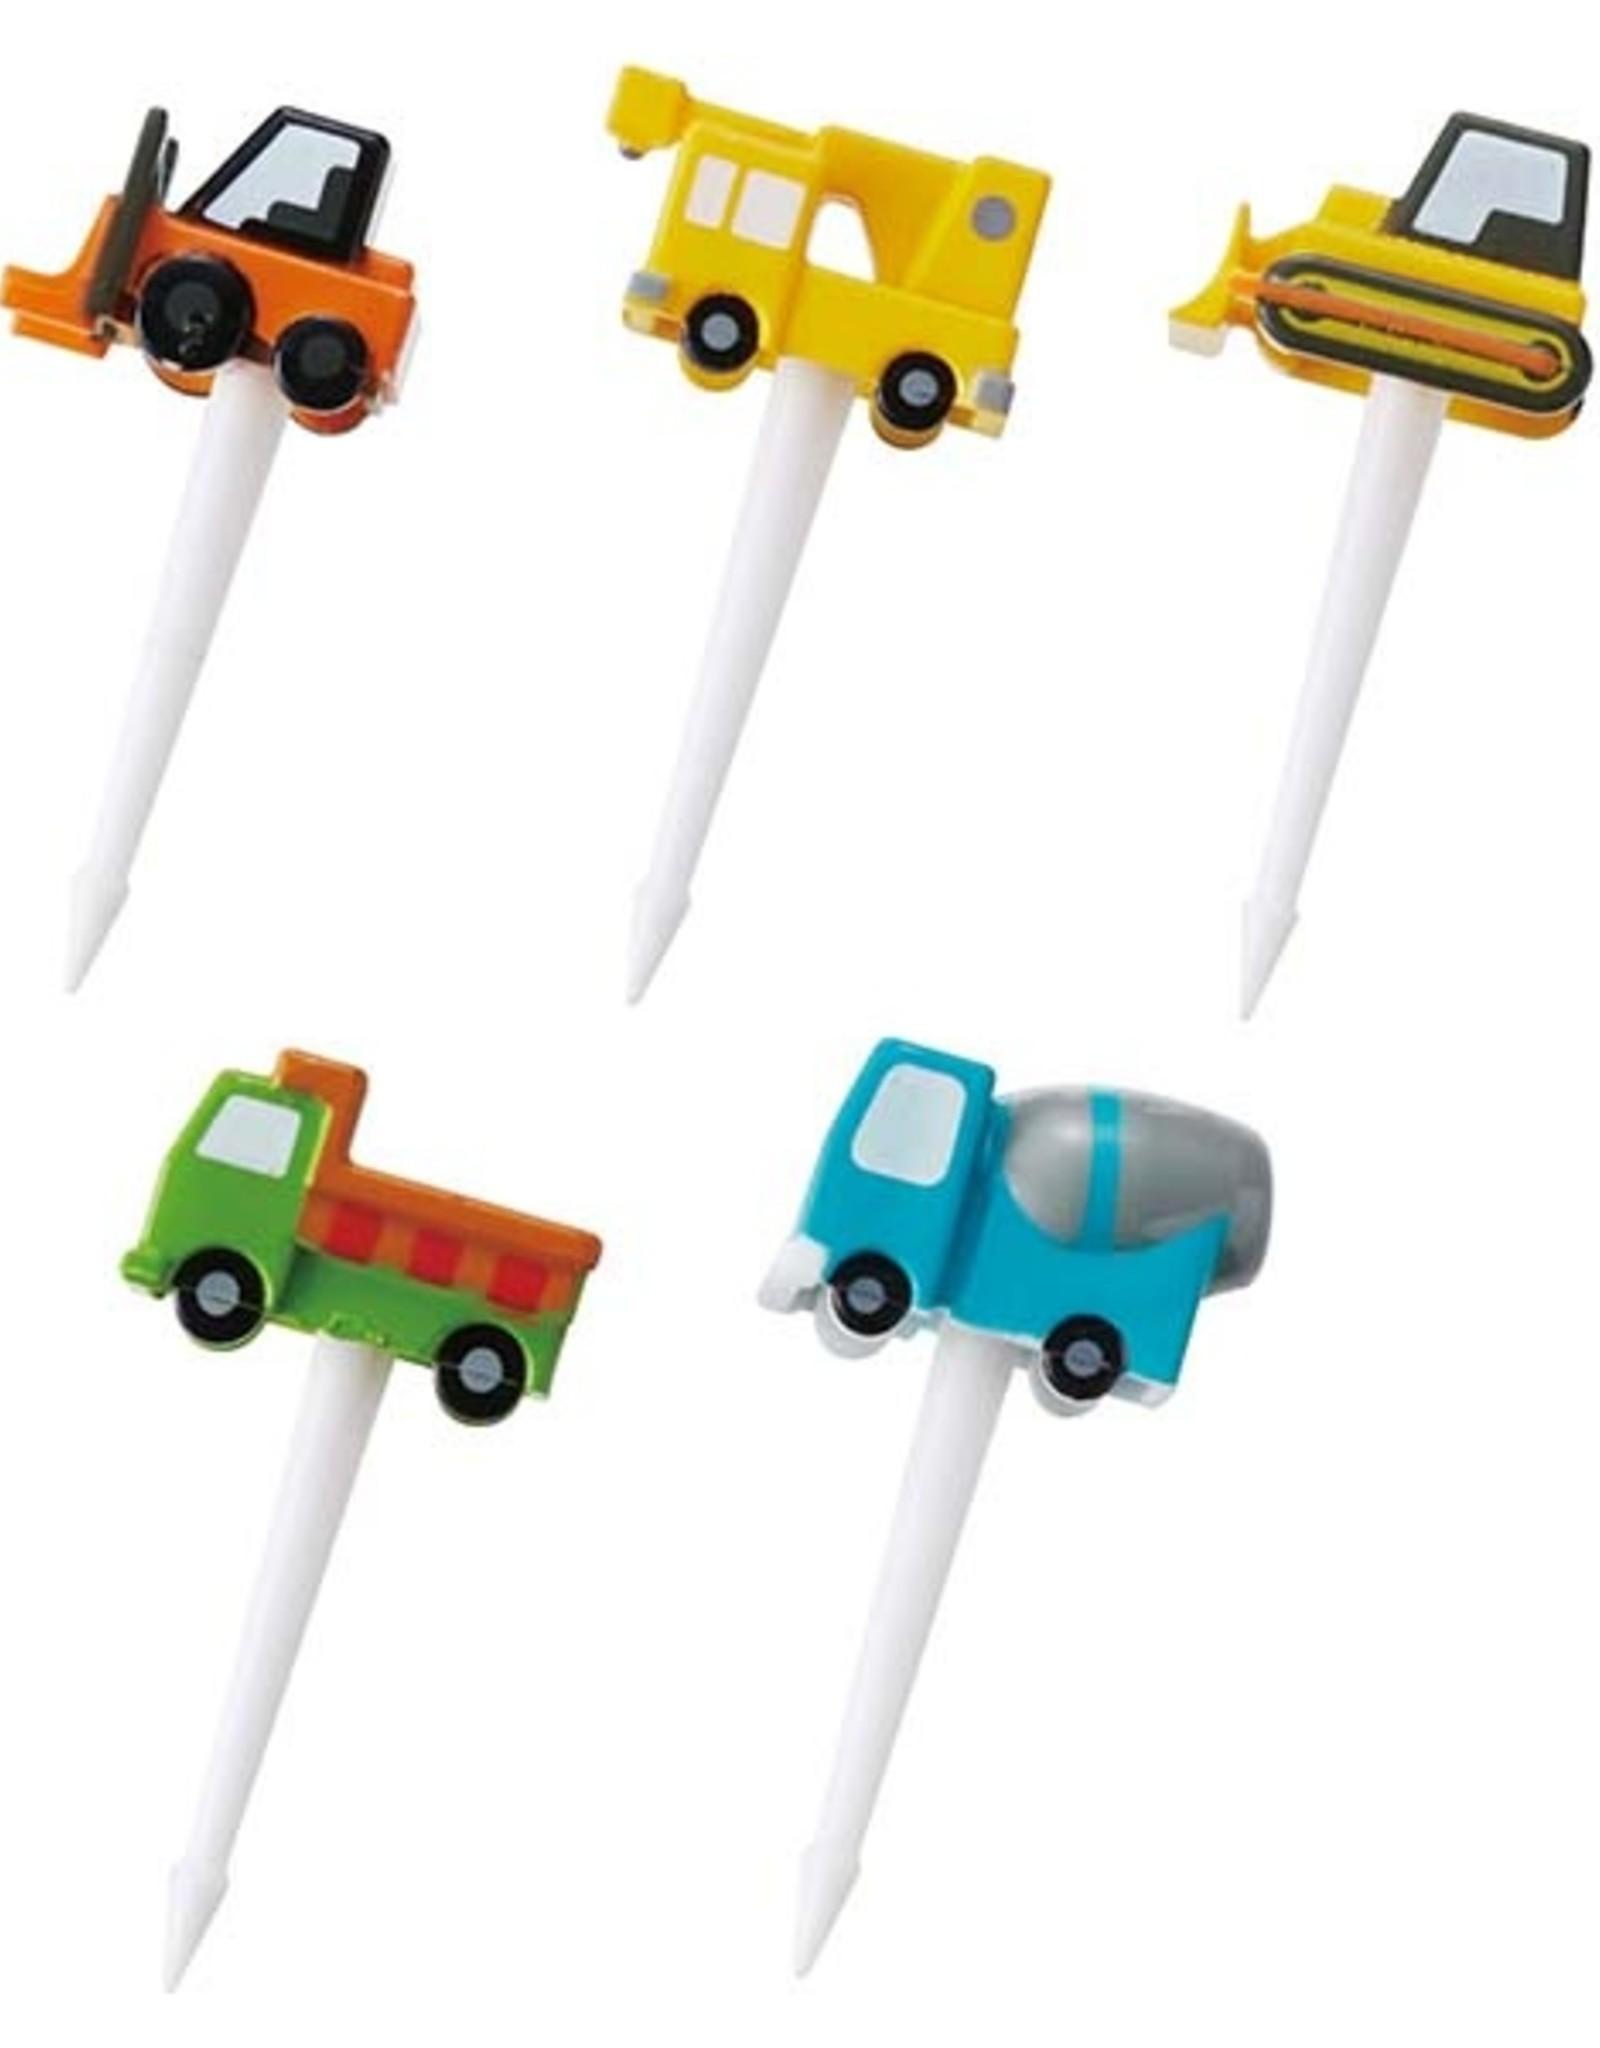 Torune Prikkertjes 'little vehicles 2'